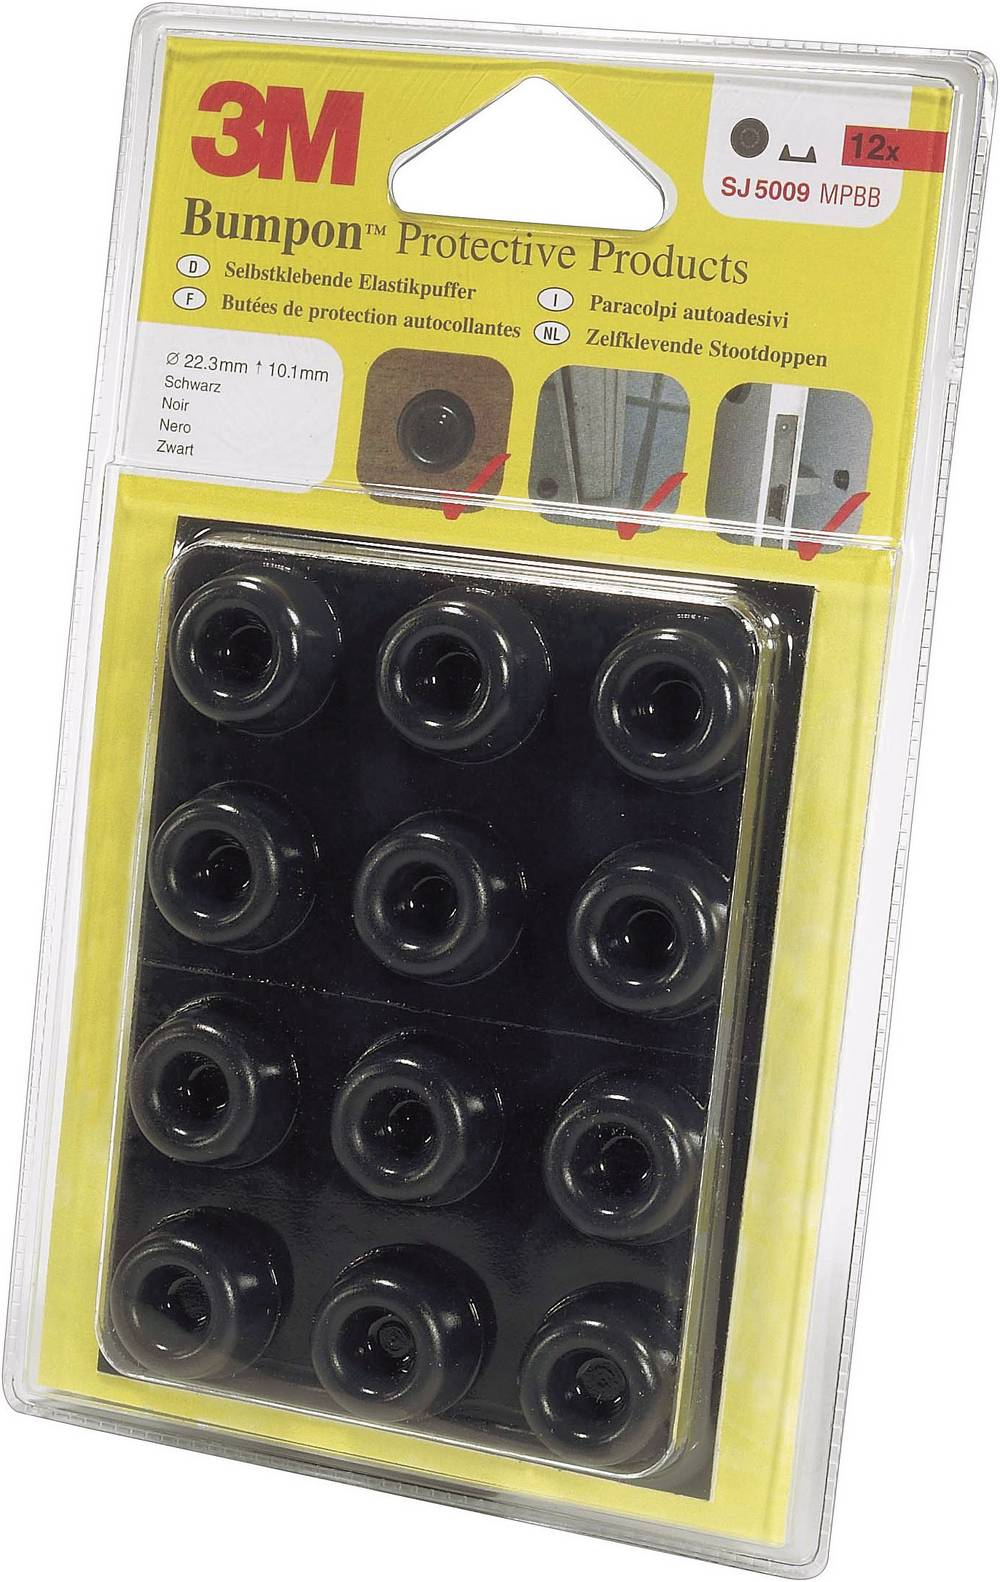 Bumpon elastični ublaživači, komplett (O x V) 22.3 mm x 10.1mm SJ 5009 MPBB 3M